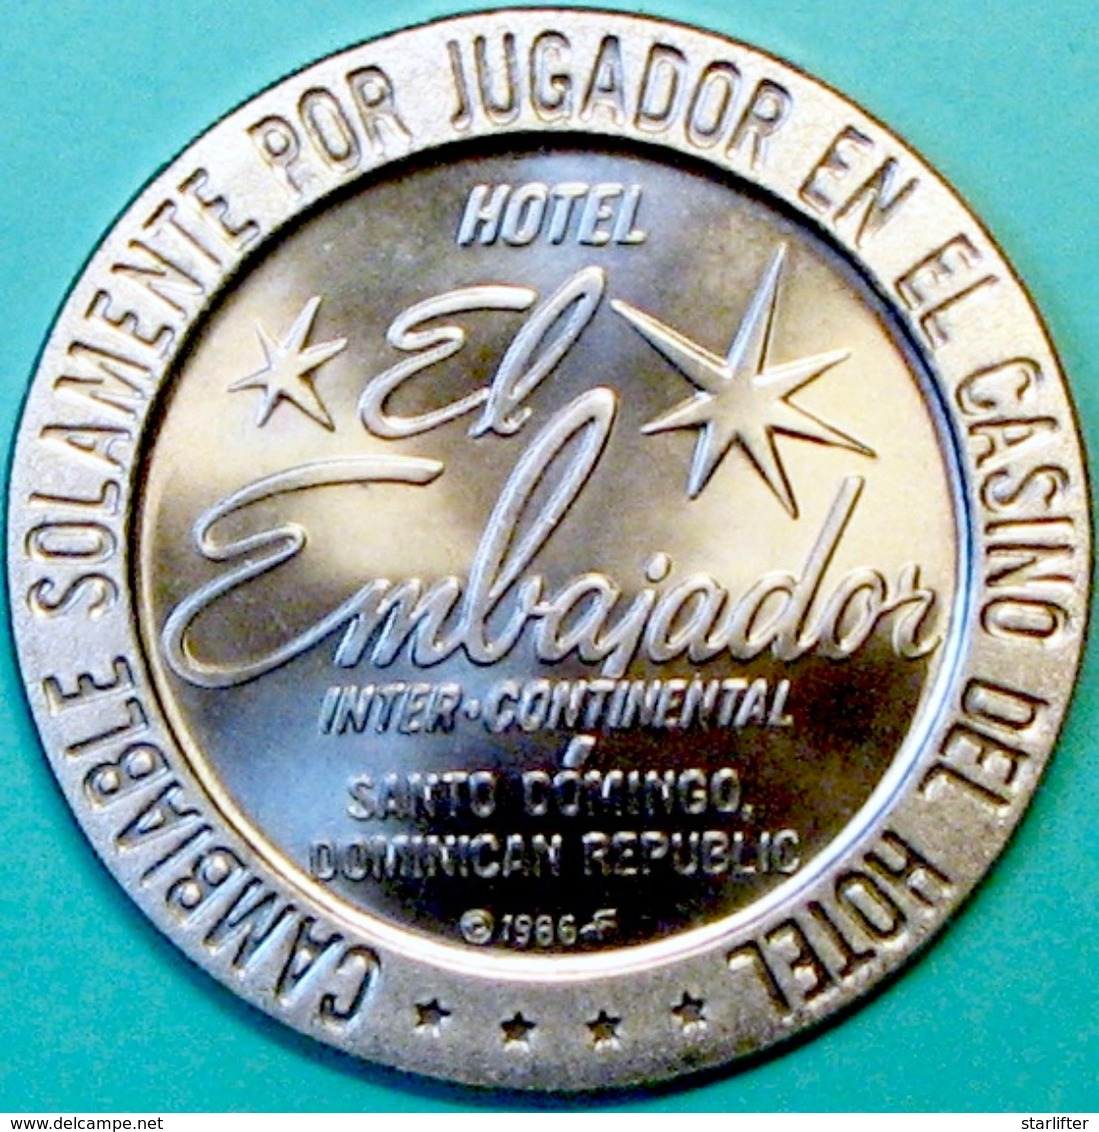 $1 Casino Token. El Embajador, Dominican Republic. 1966 NEW. D40. - Casino